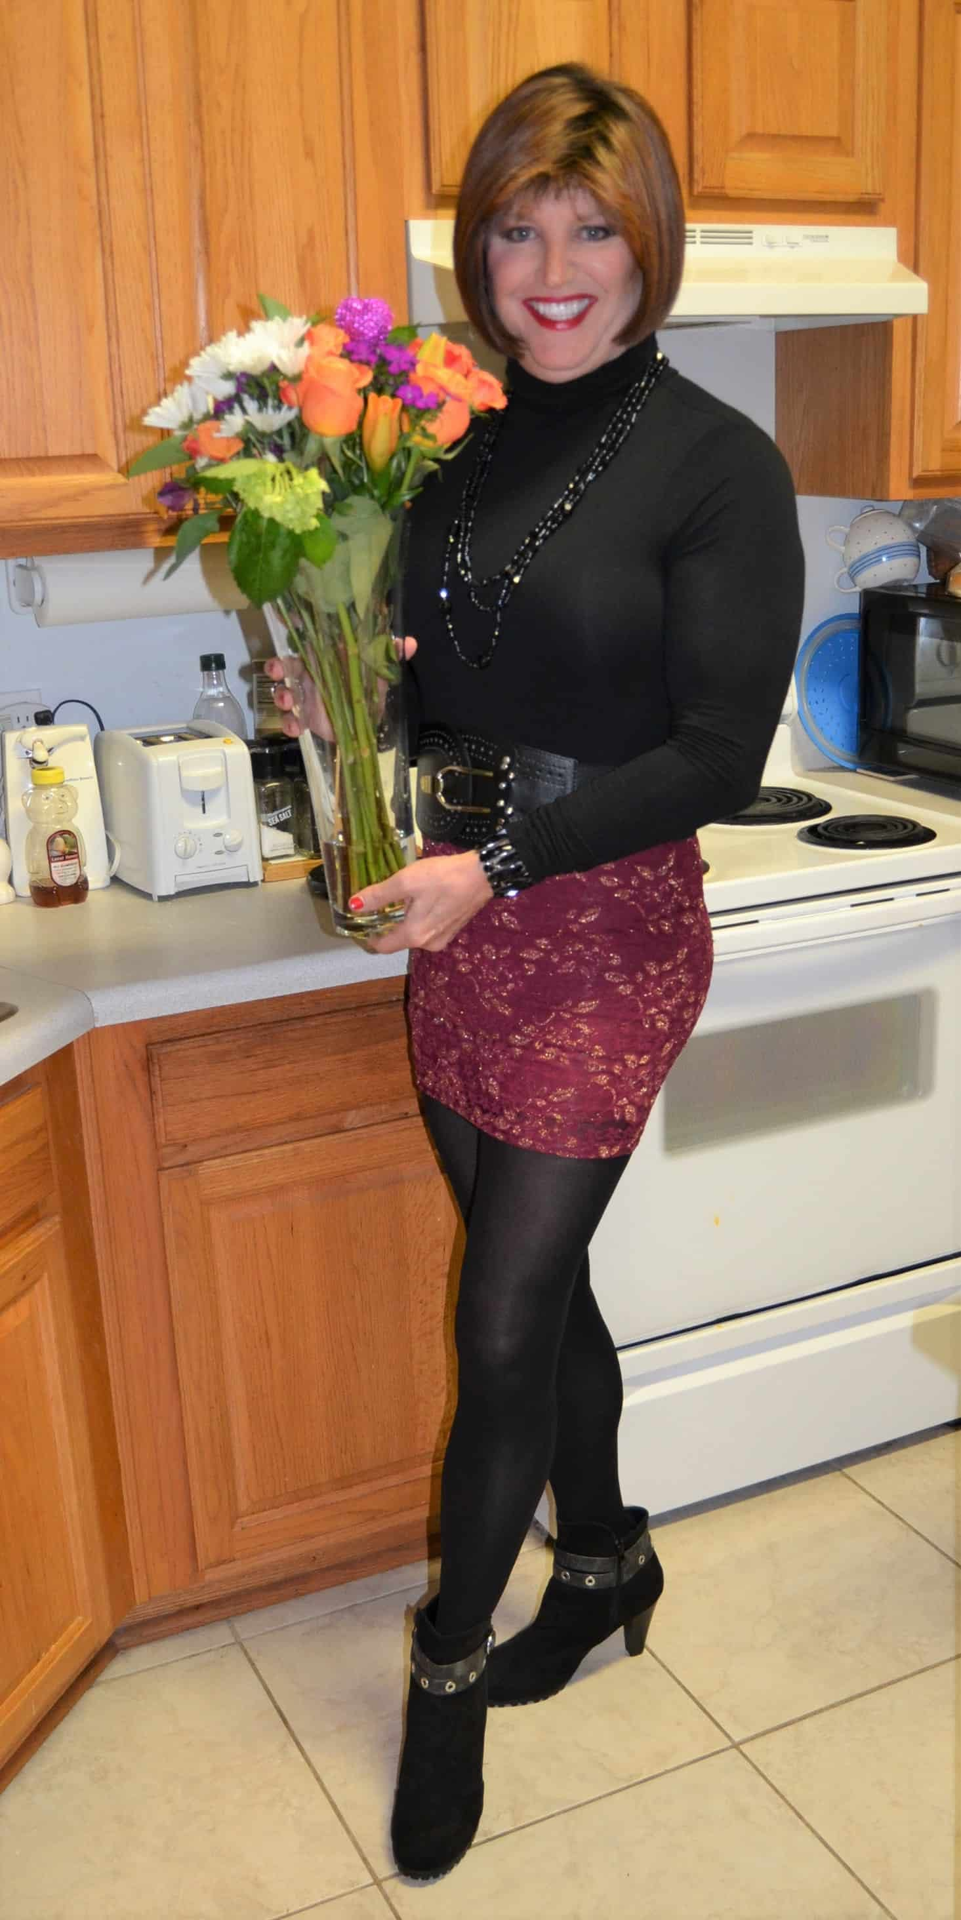 Yep, My Sweetie Gets Me Flowers On Valentines Day!